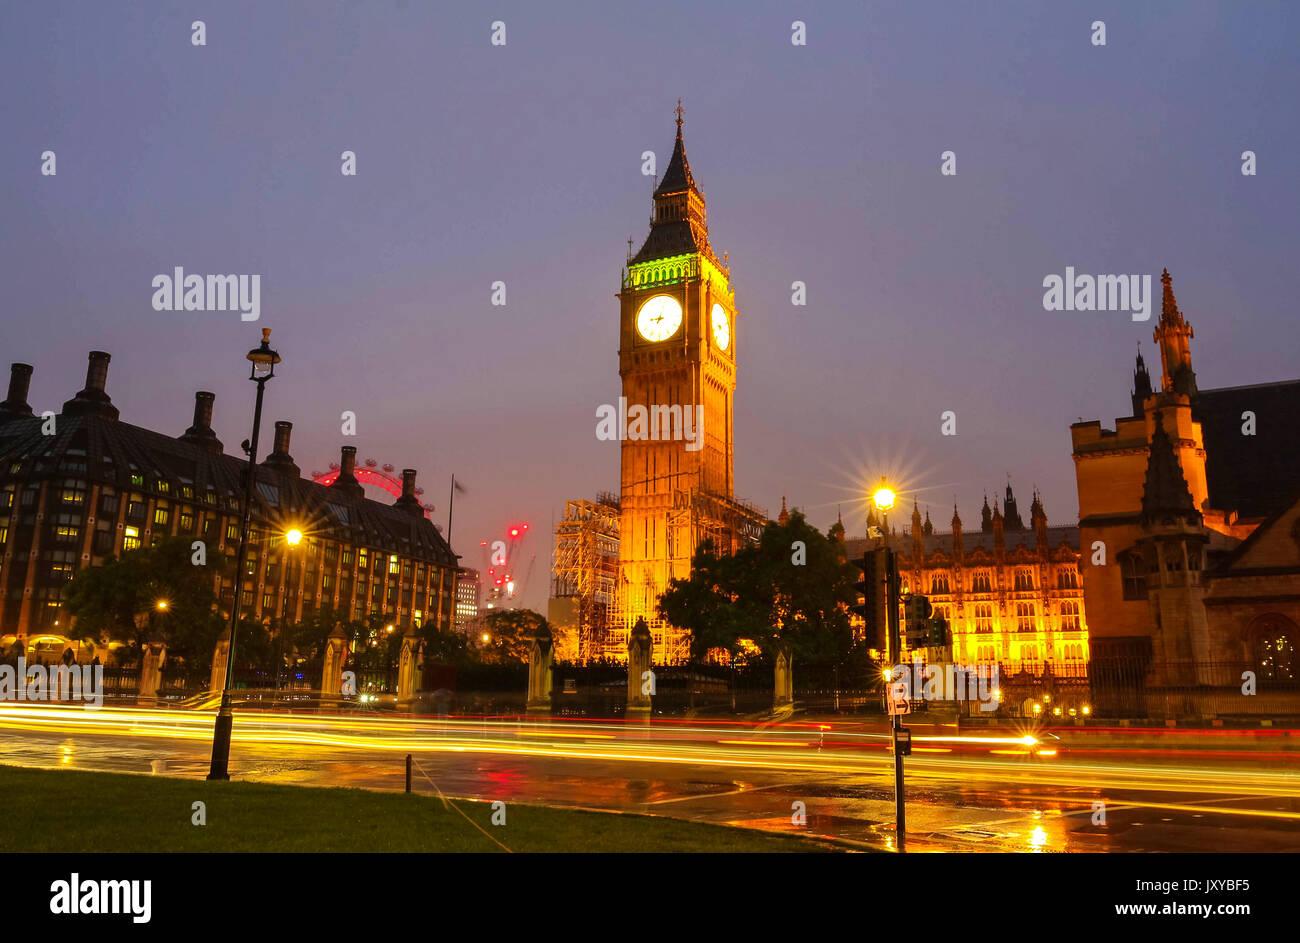 Torre del Big Ben en la noche lluviosa, Londres, Reino Unido. Imagen De Stock